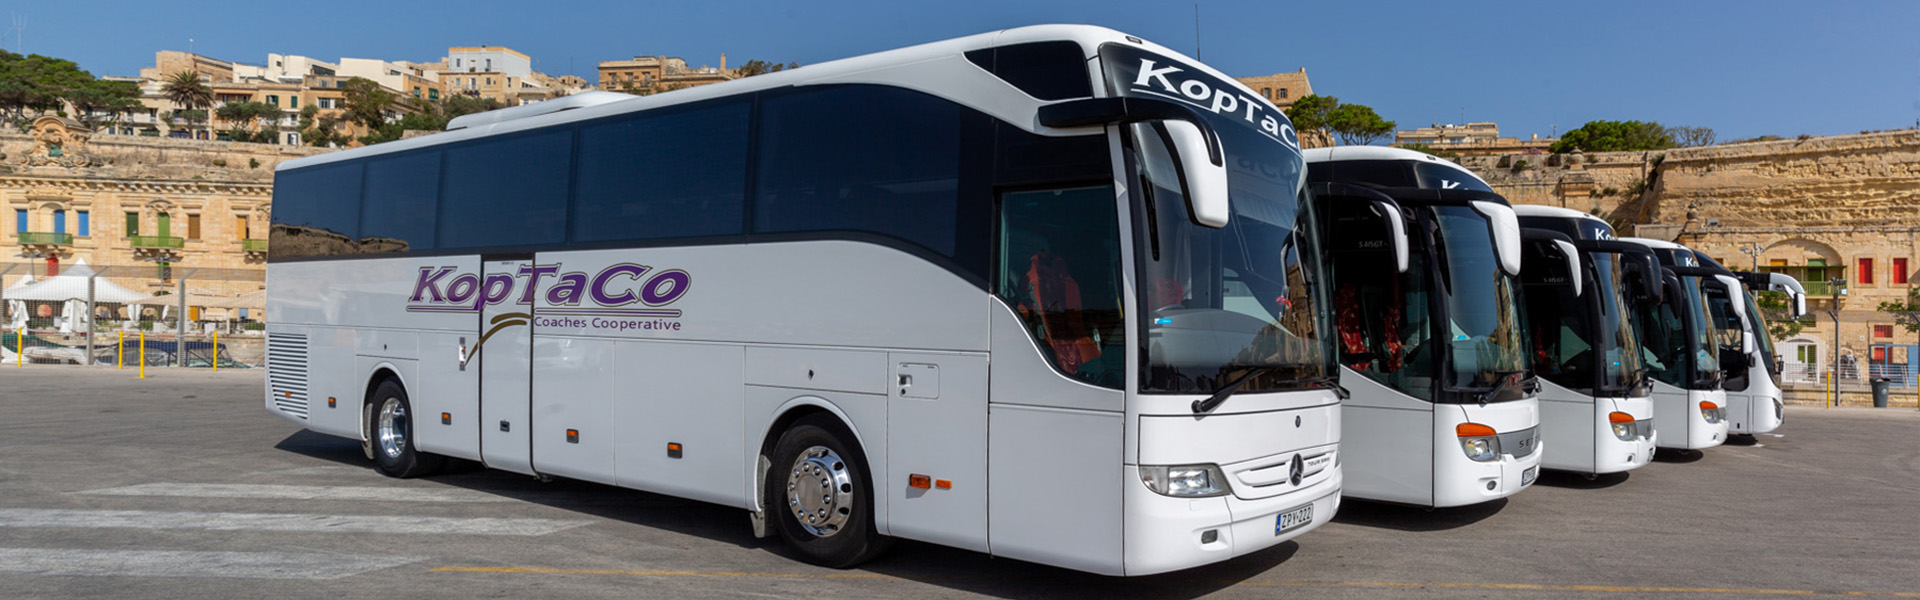 koptaco bus transport service malta slide 1